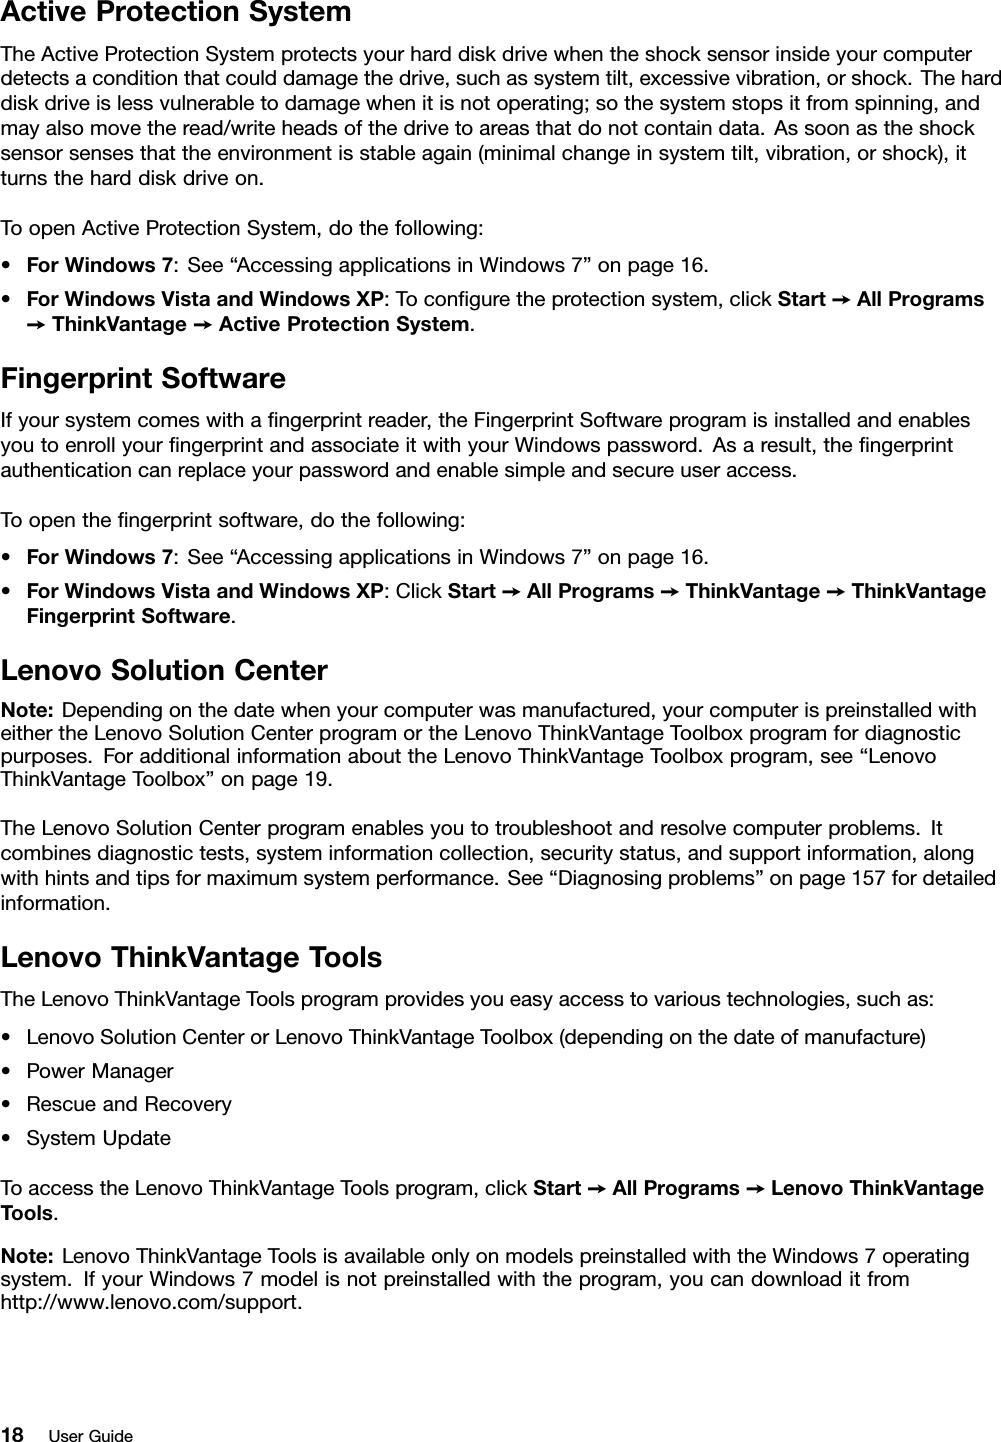 18 Error Secure Flash Rom Verify Fail Lenovo